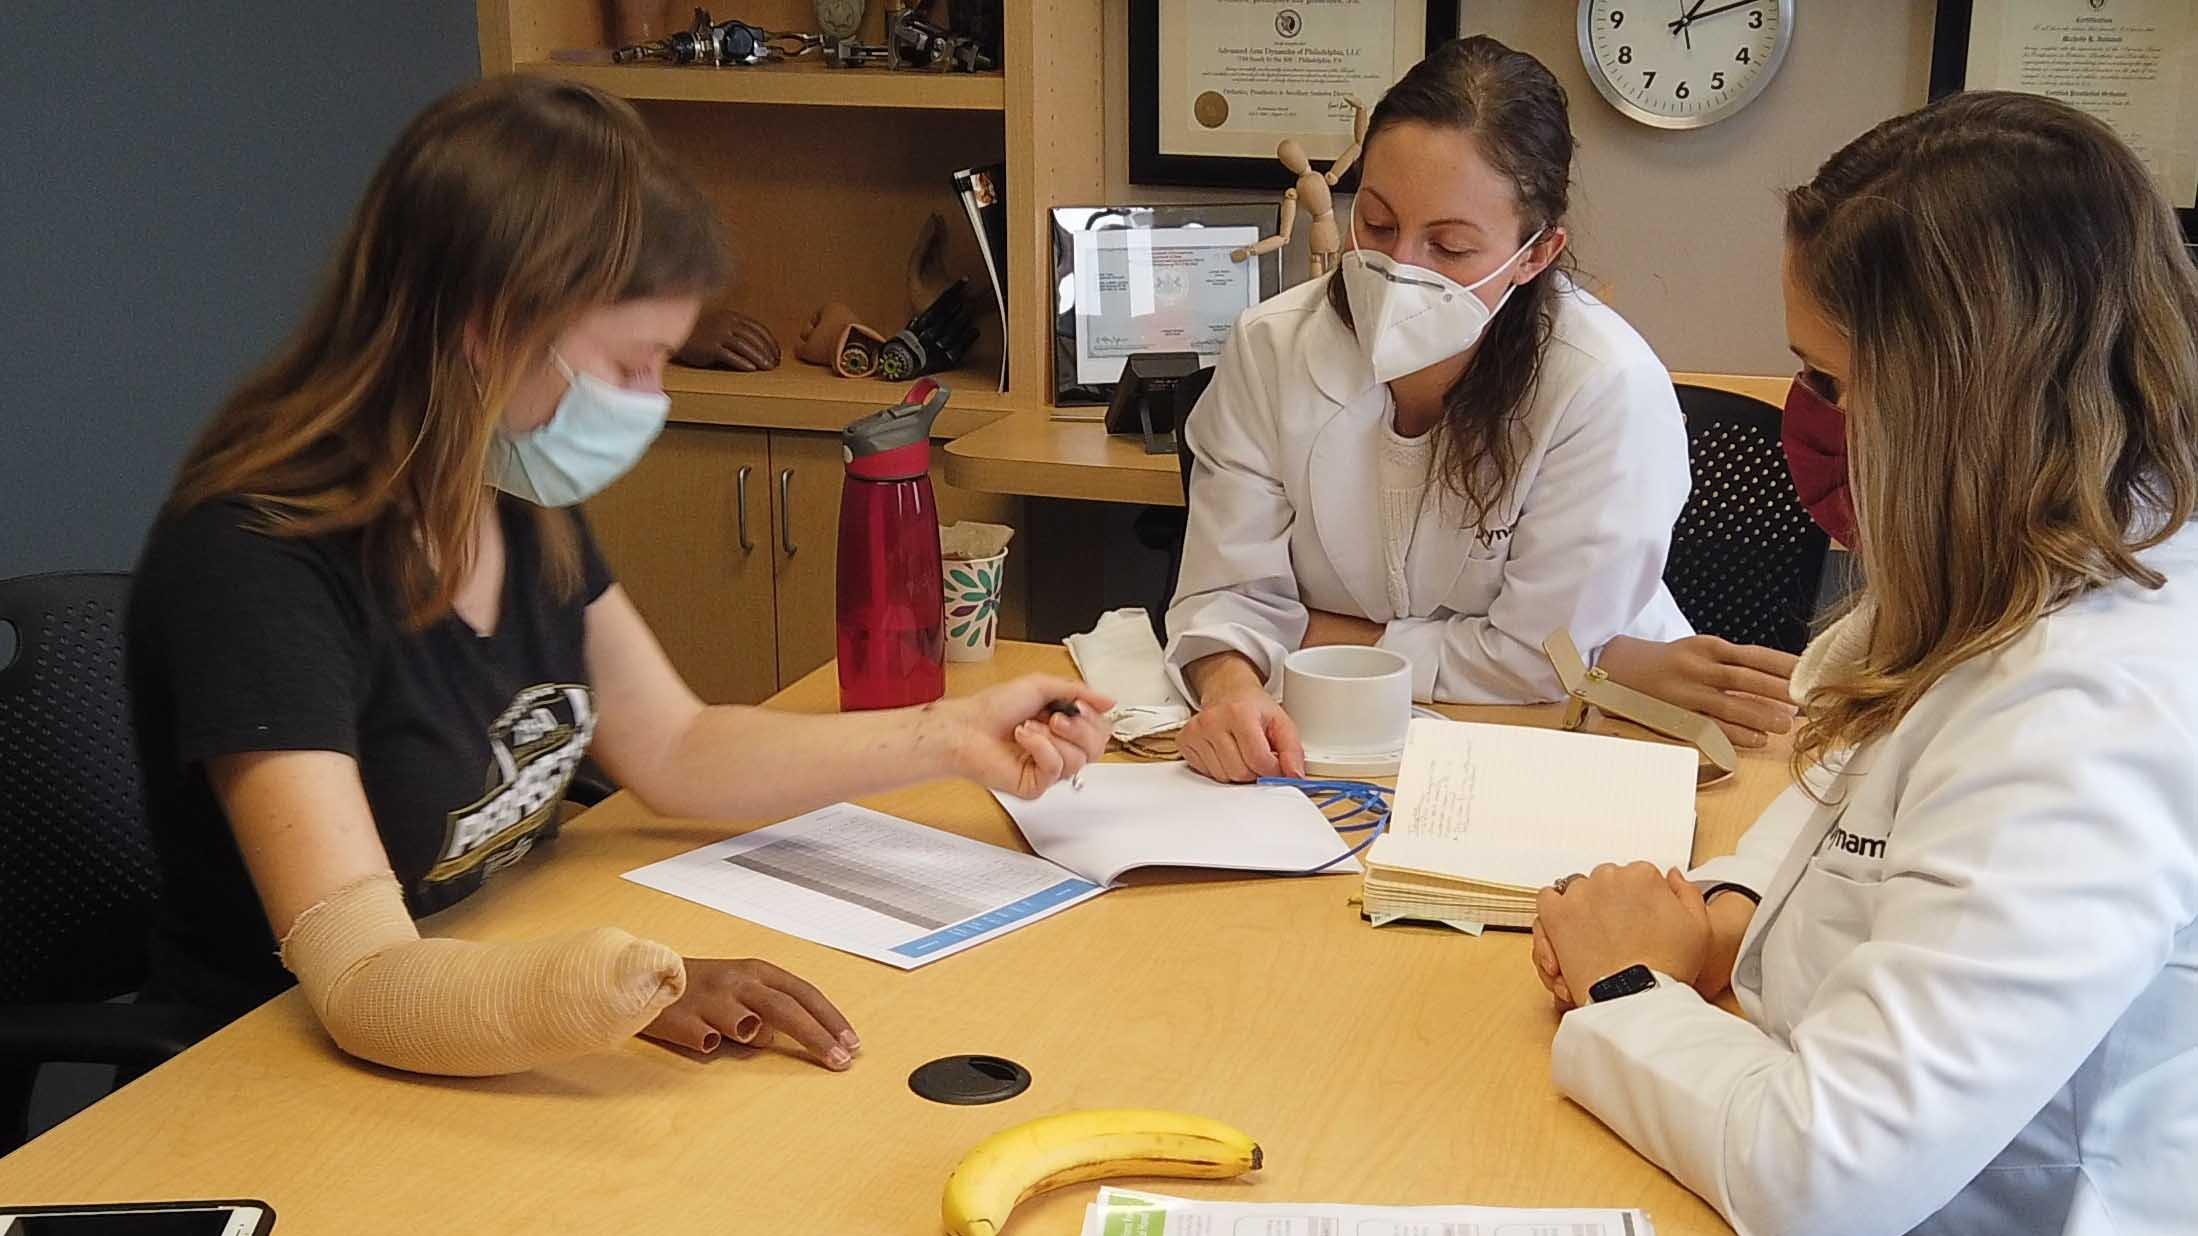 Michelle Intintoli, MSPO, CPO/L and Elyssa Vizzier, MOT, OTR/L work with a new patient